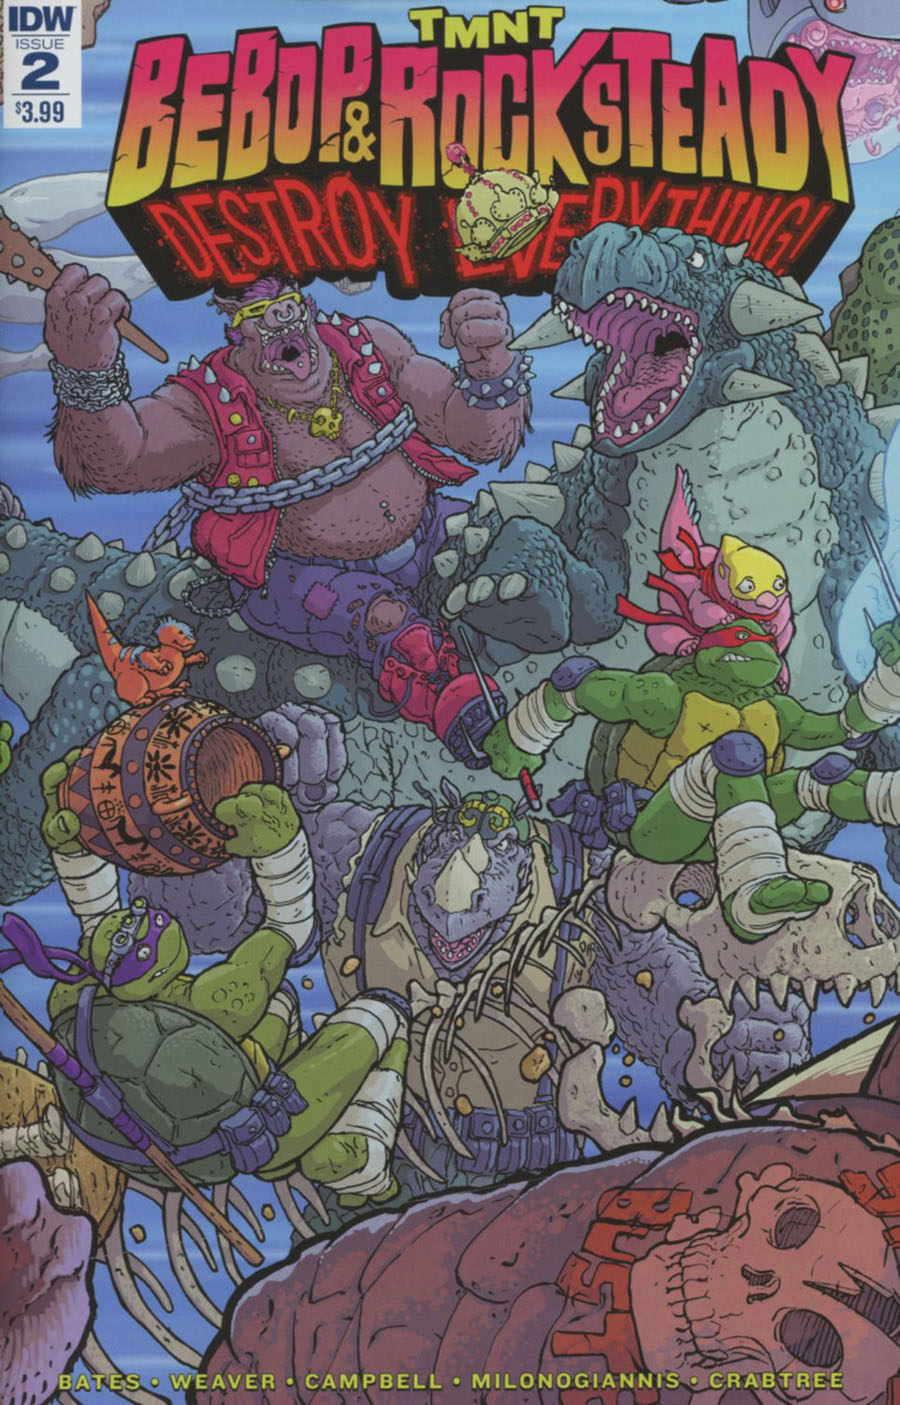 Teenage Mutant Ninja Turtles Bebop & Rocksteady Destroy Everything #2 Cover A Regular Nick Pitarra Cover